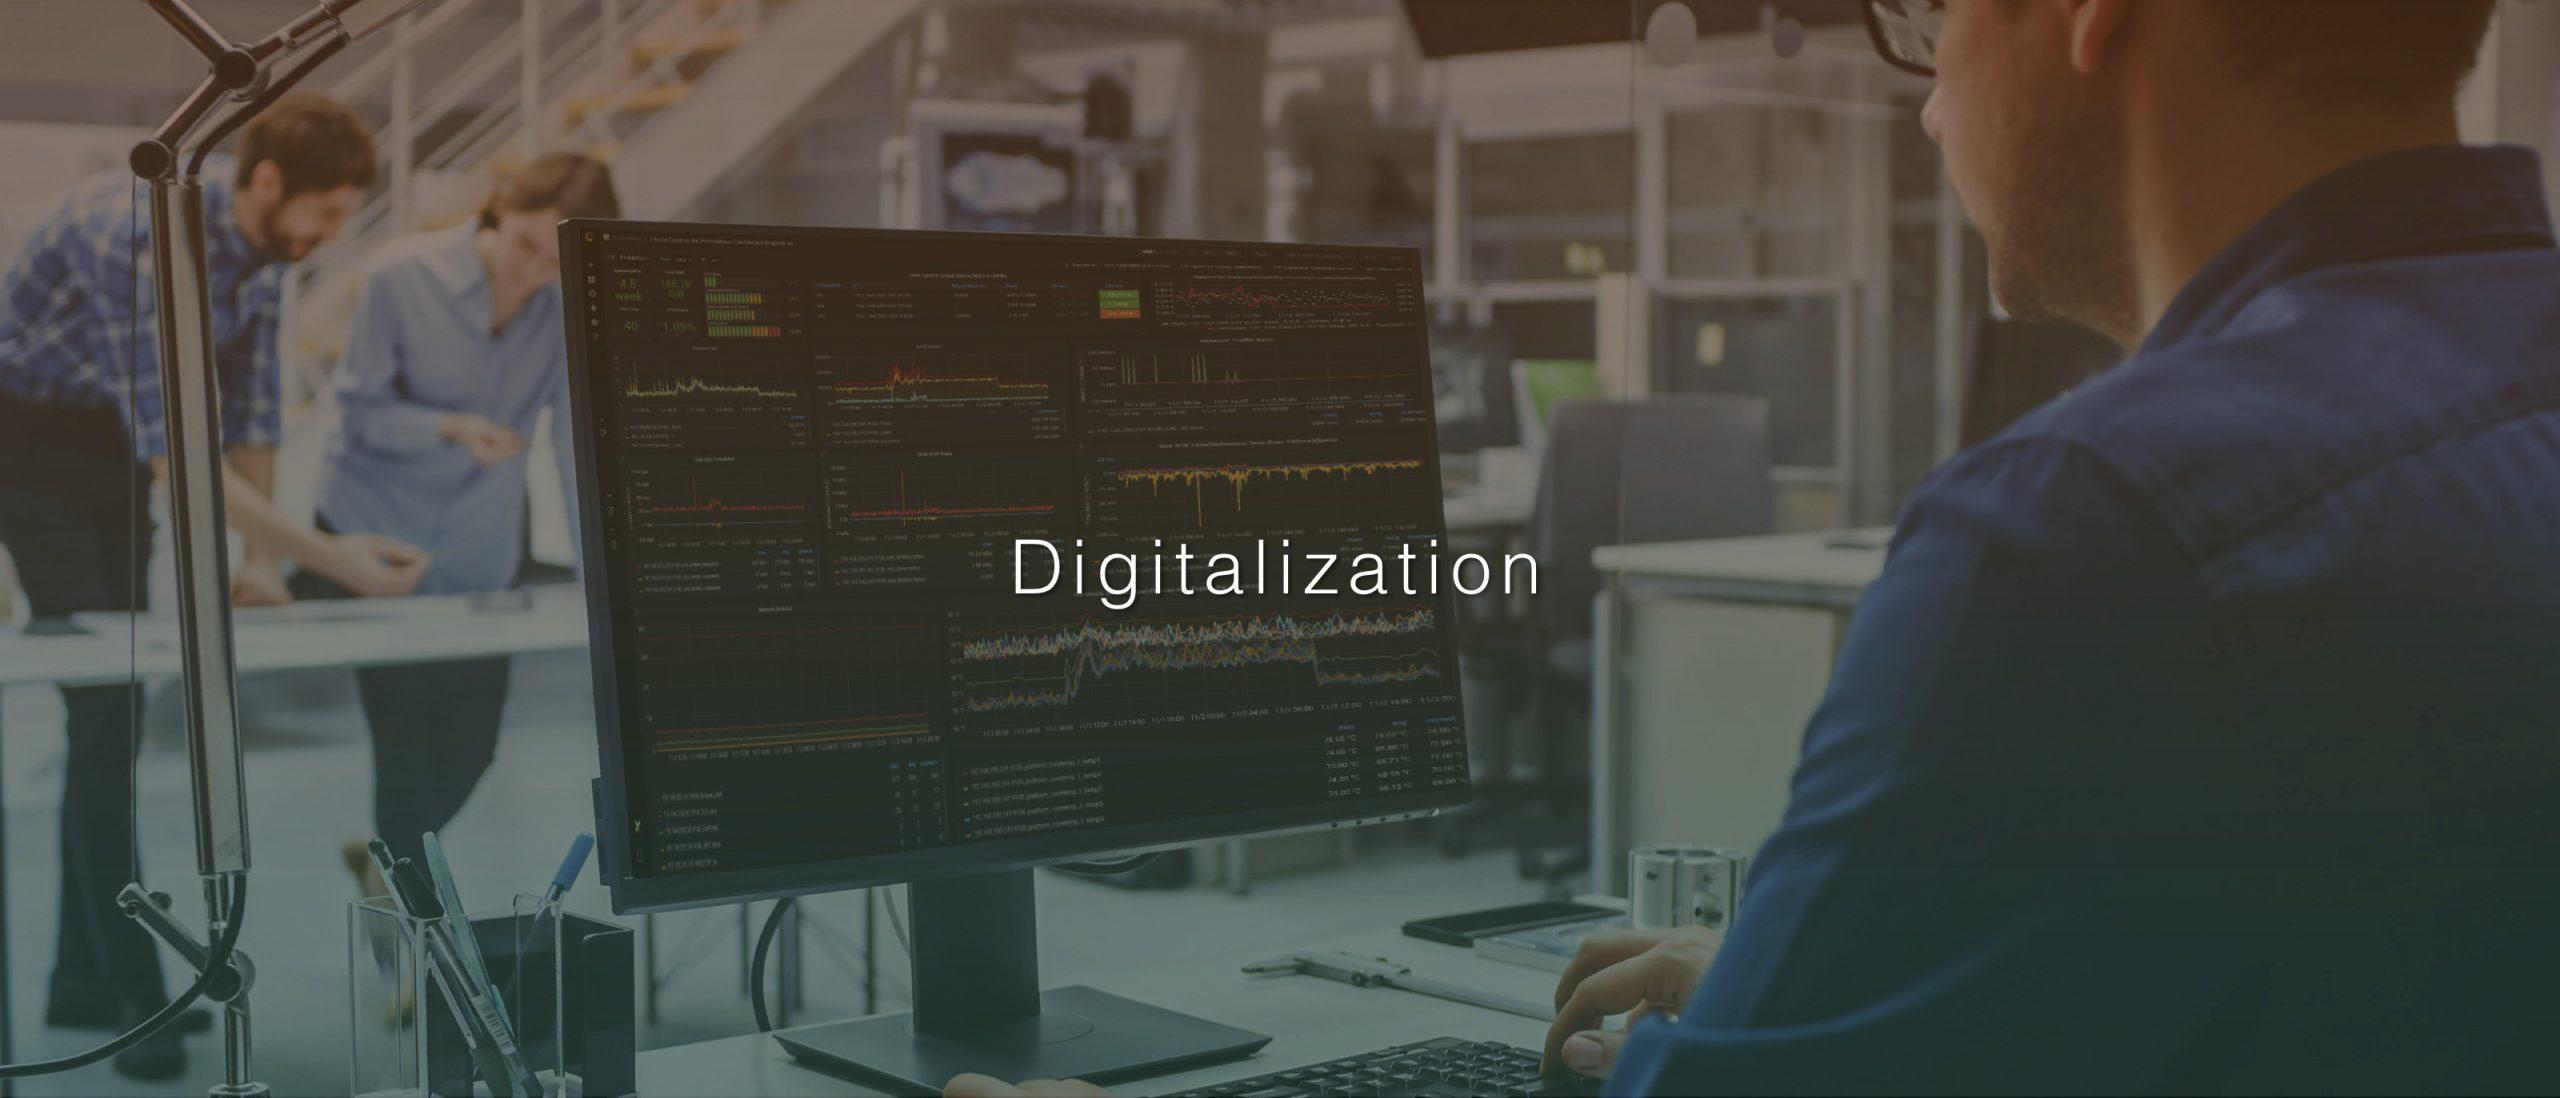 PADDI Digitalization IIoT Solution